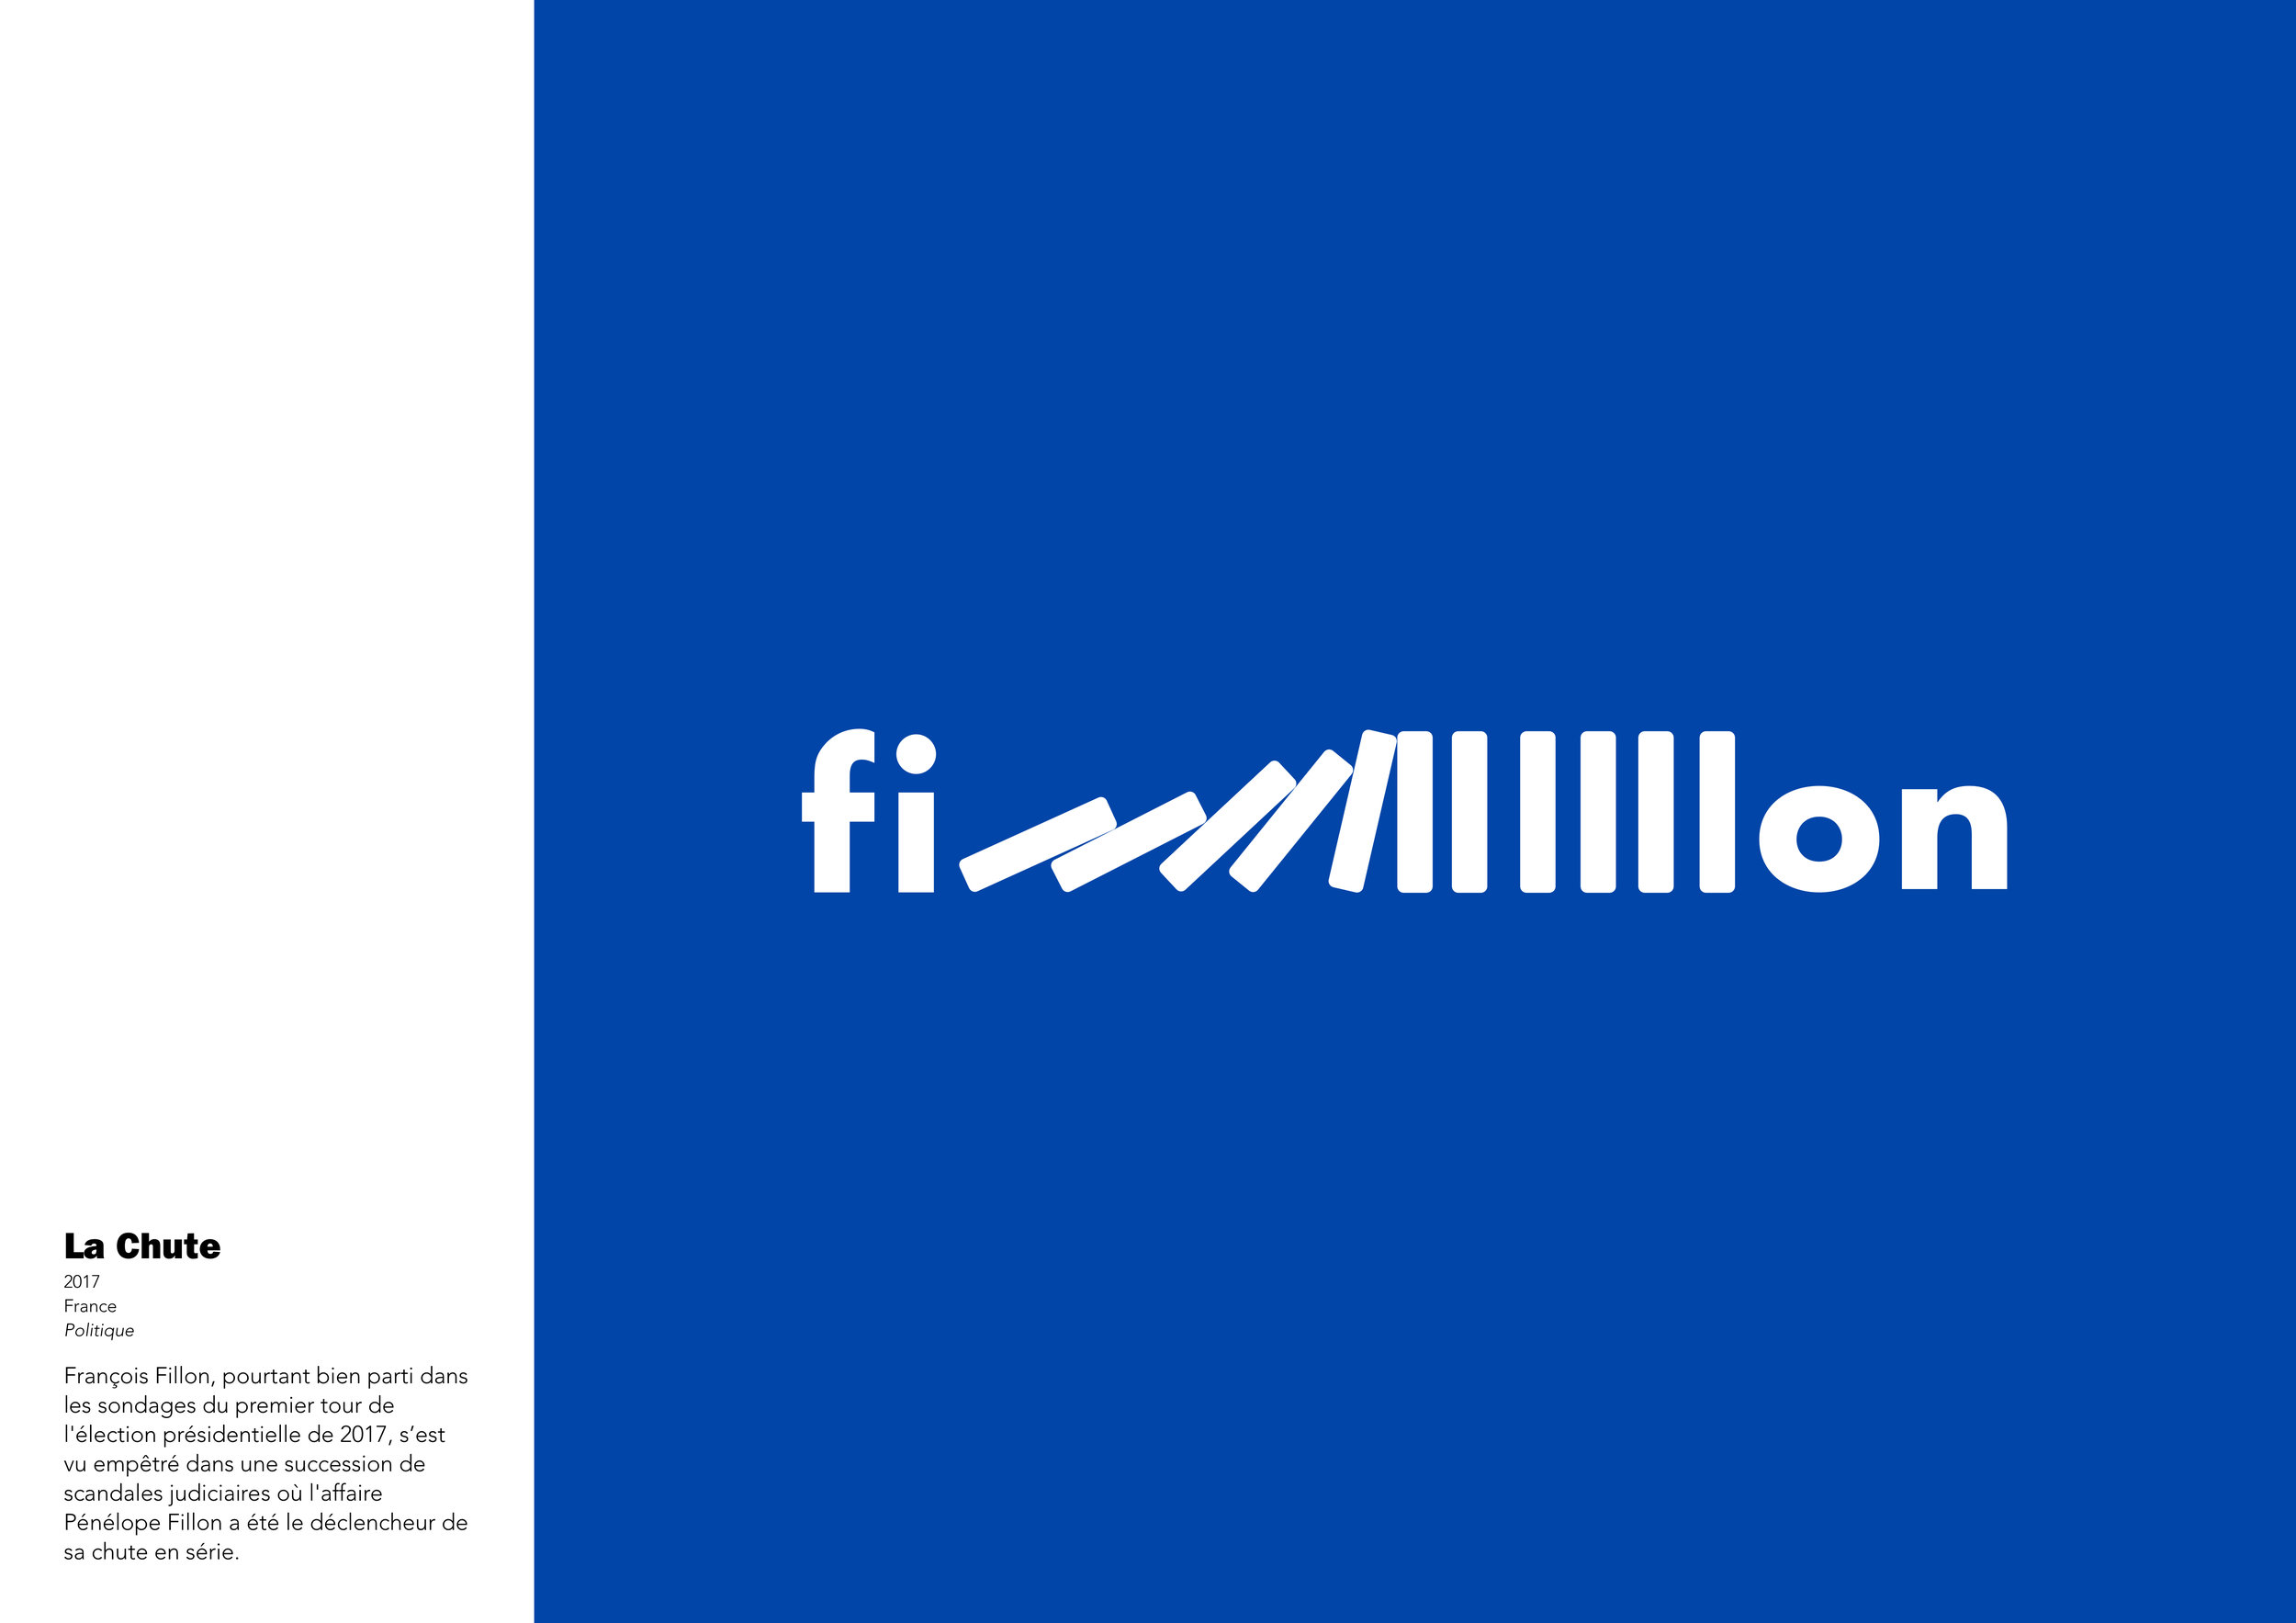 Politics-France-presidential-elections-François-Fillon-Fall-logo-design-joy-lasry.jpg